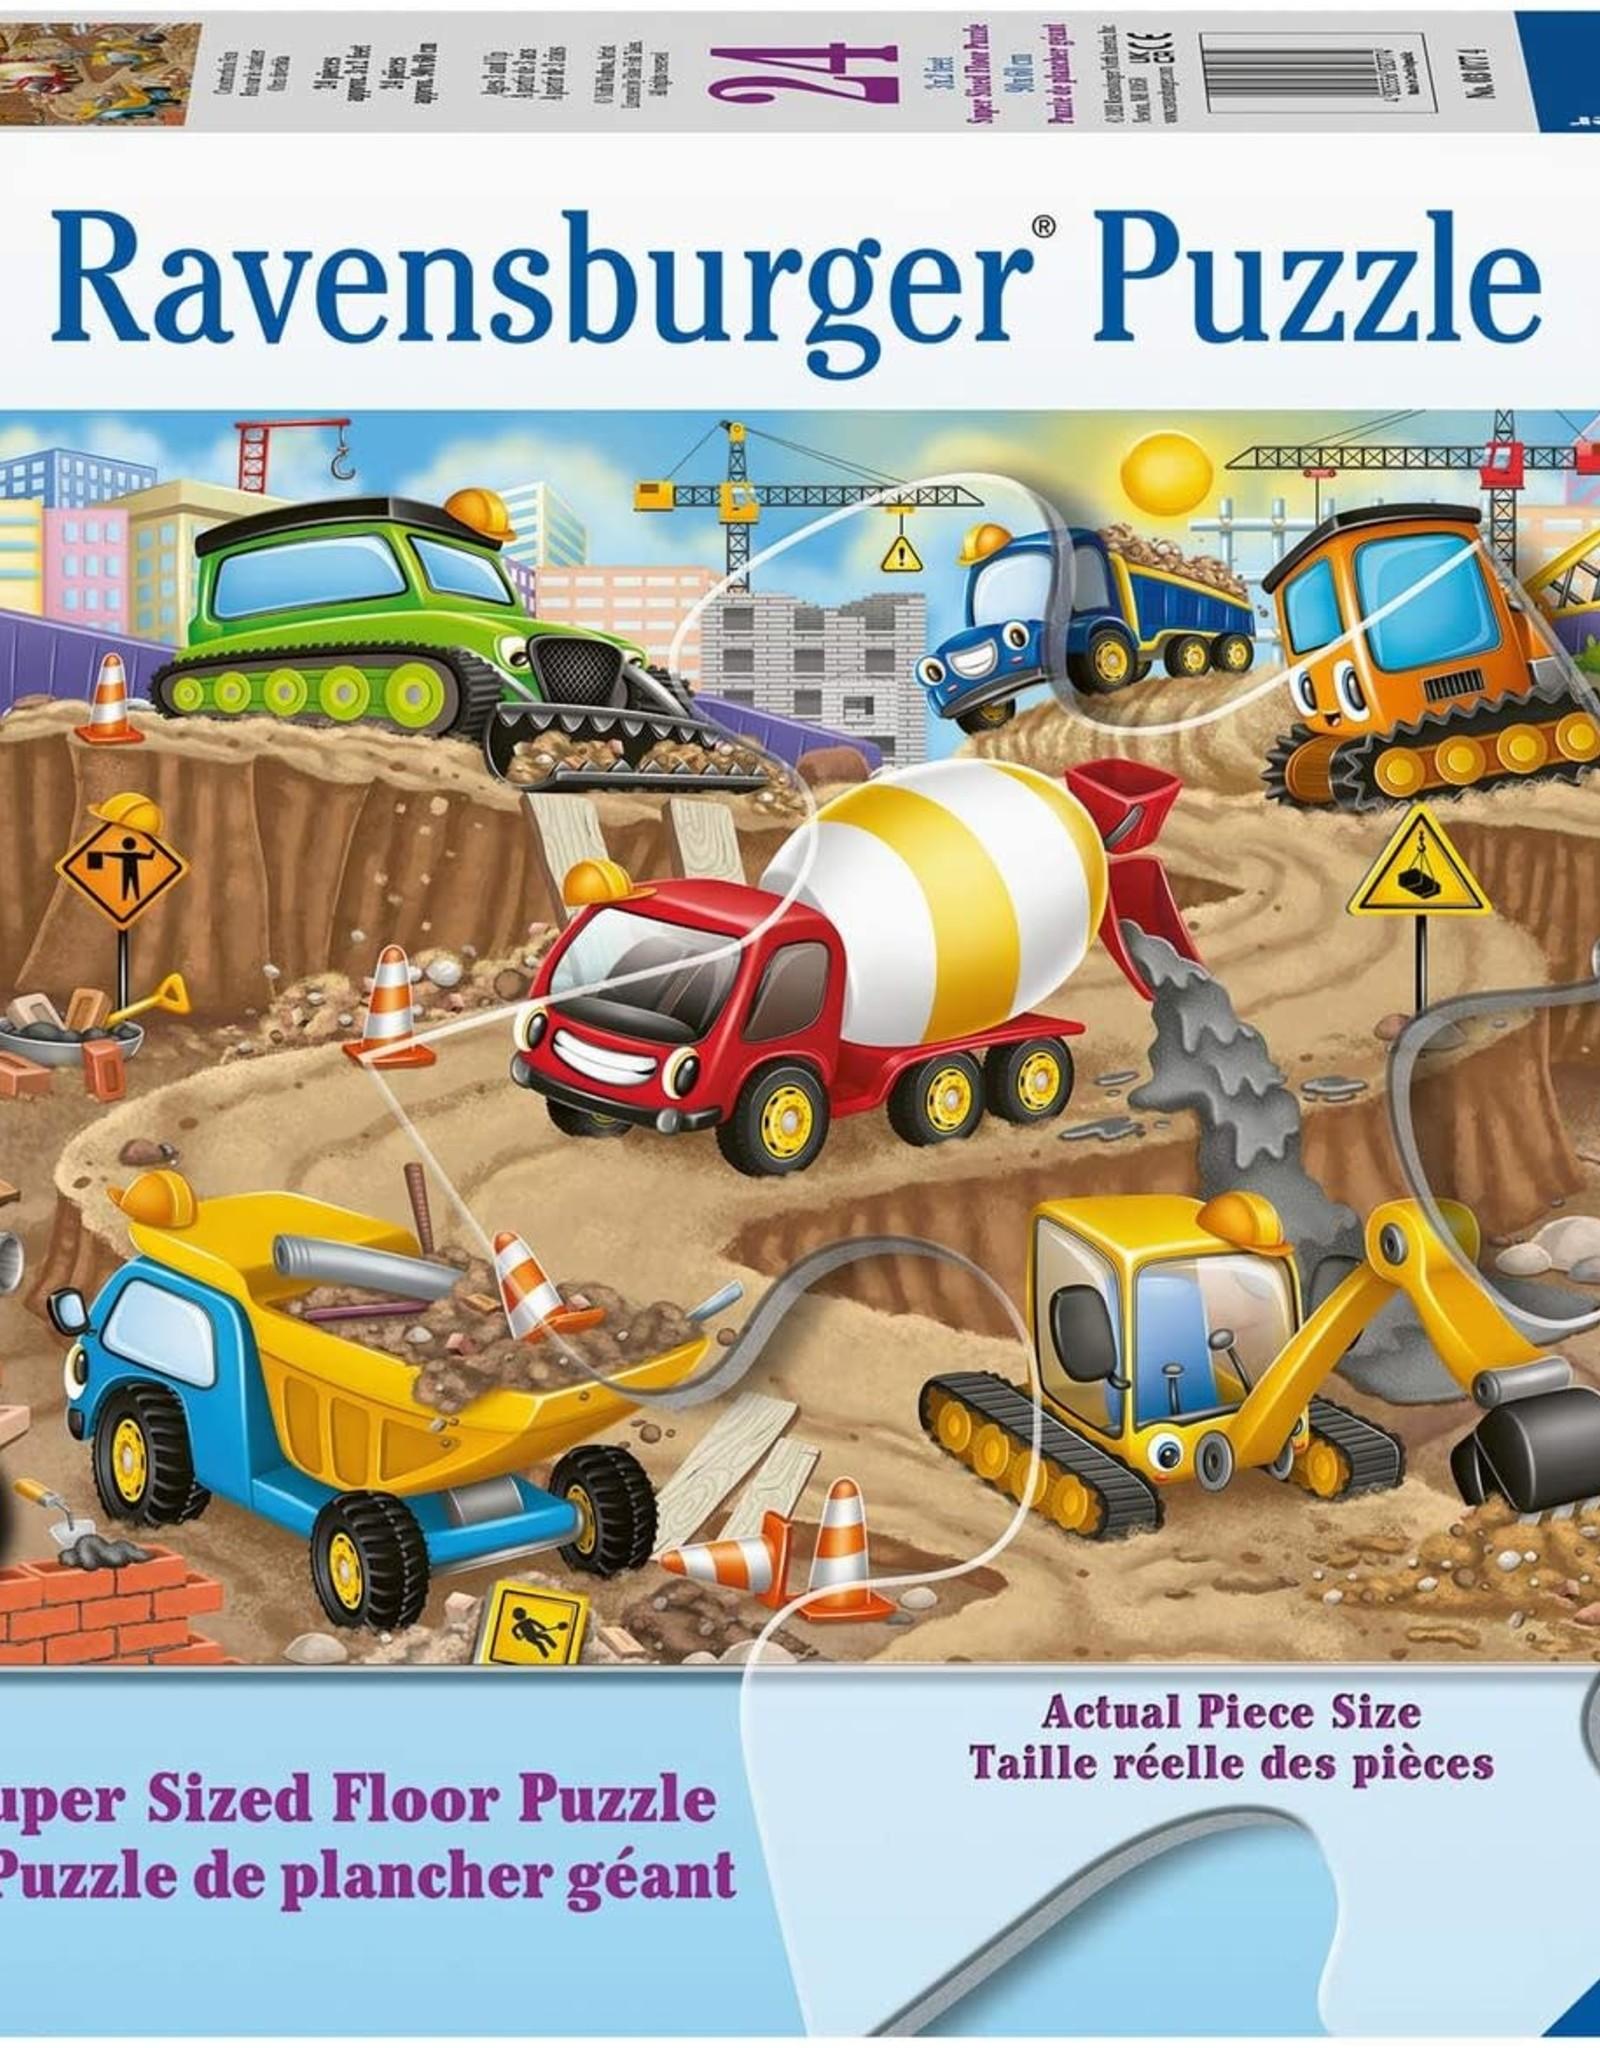 Ravensburger 24pc Floor Puzzle Construction Fun